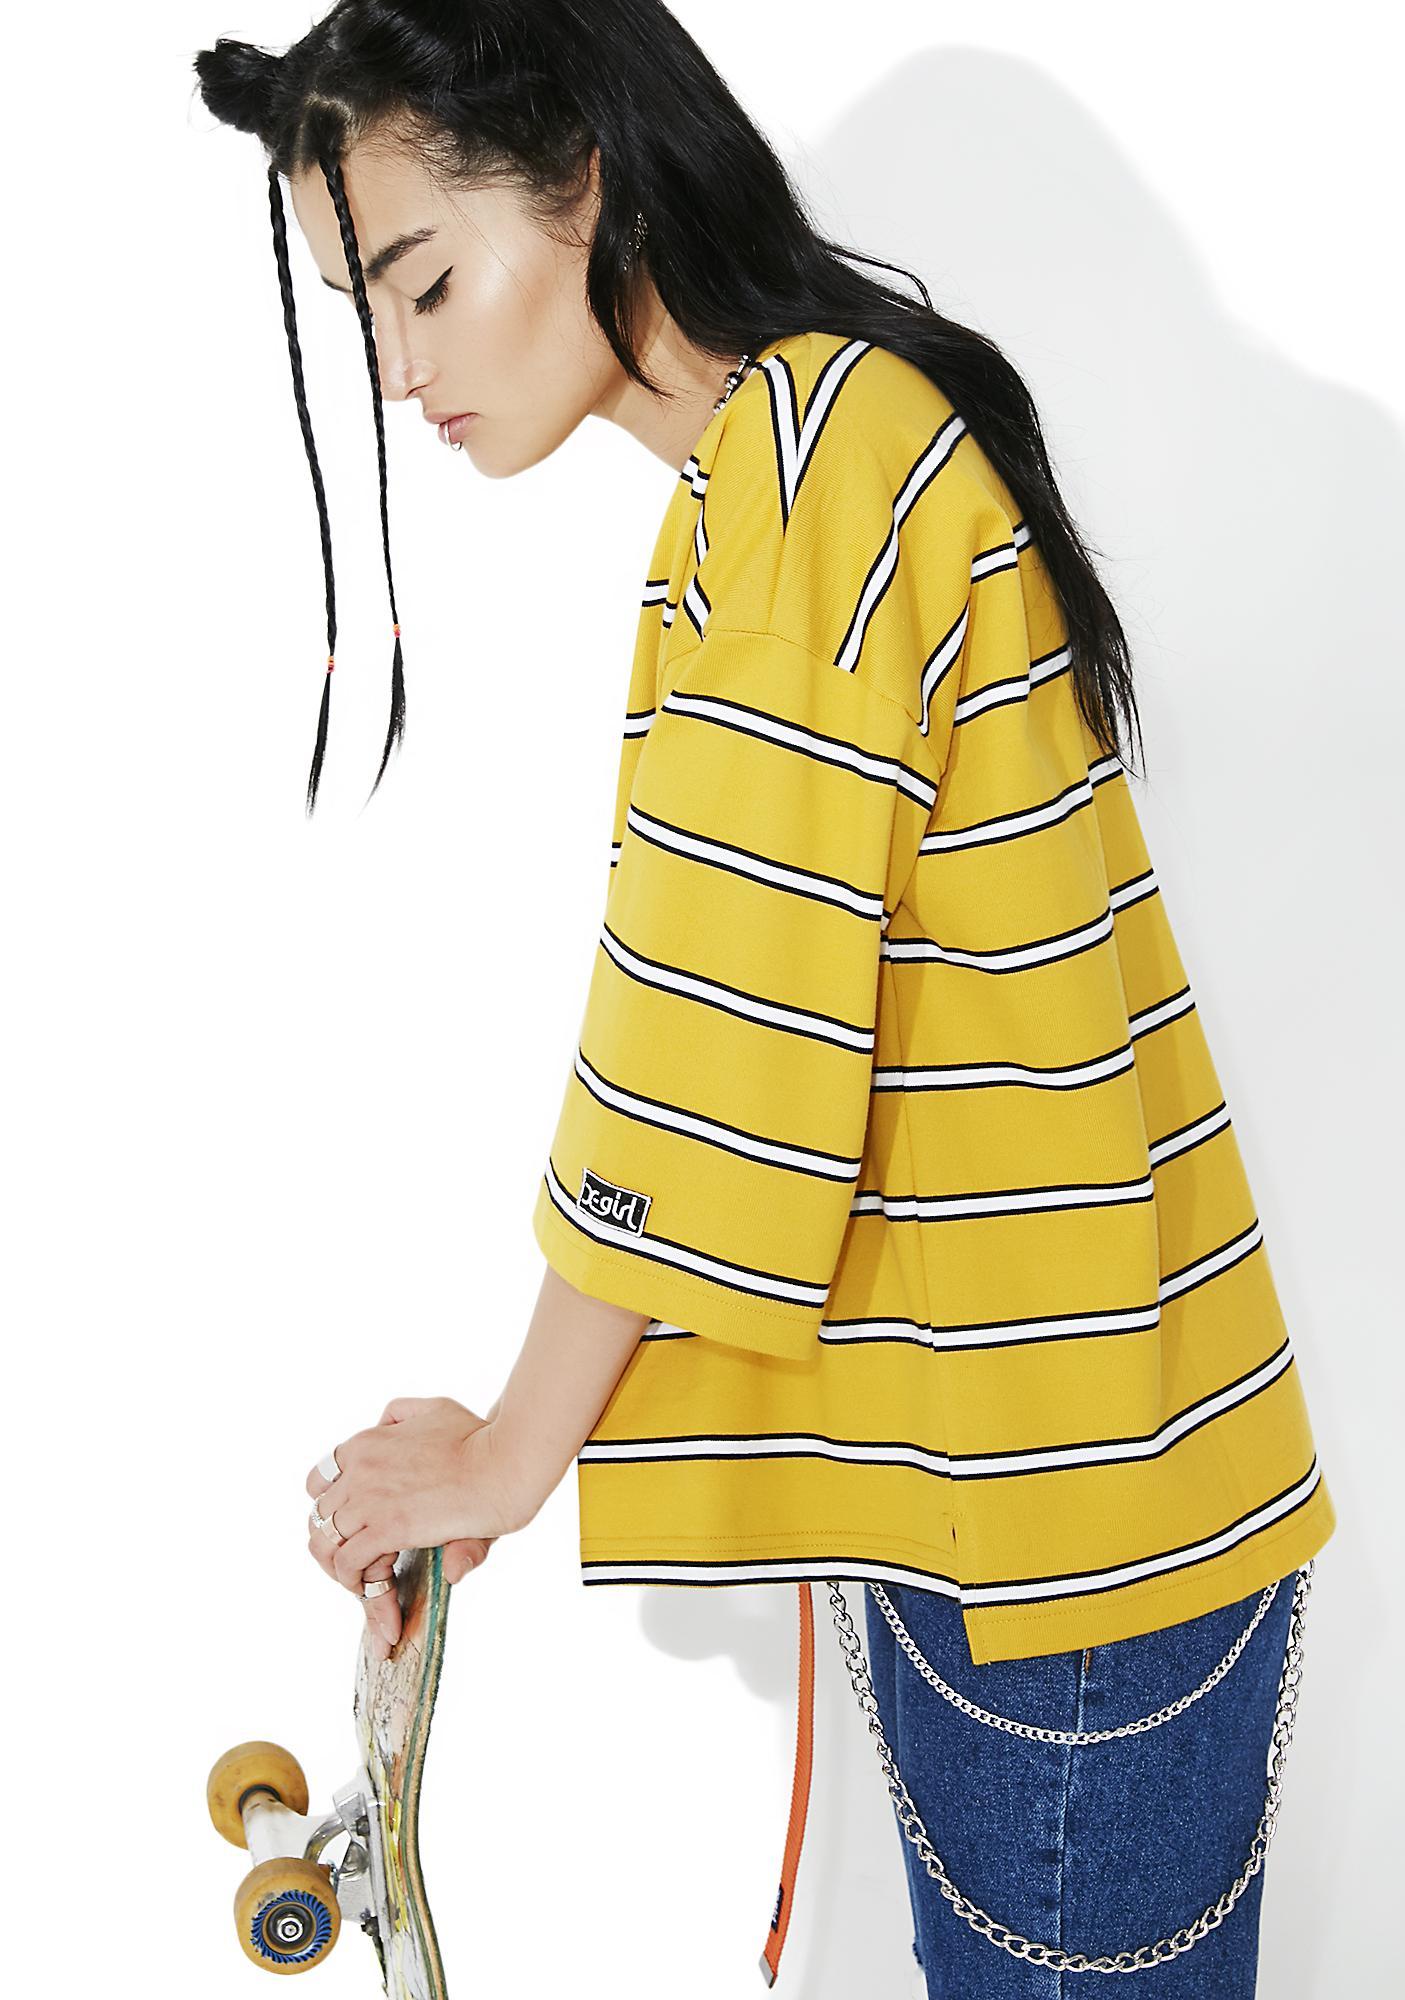 x-Girl Basic Stripe Boxy Top